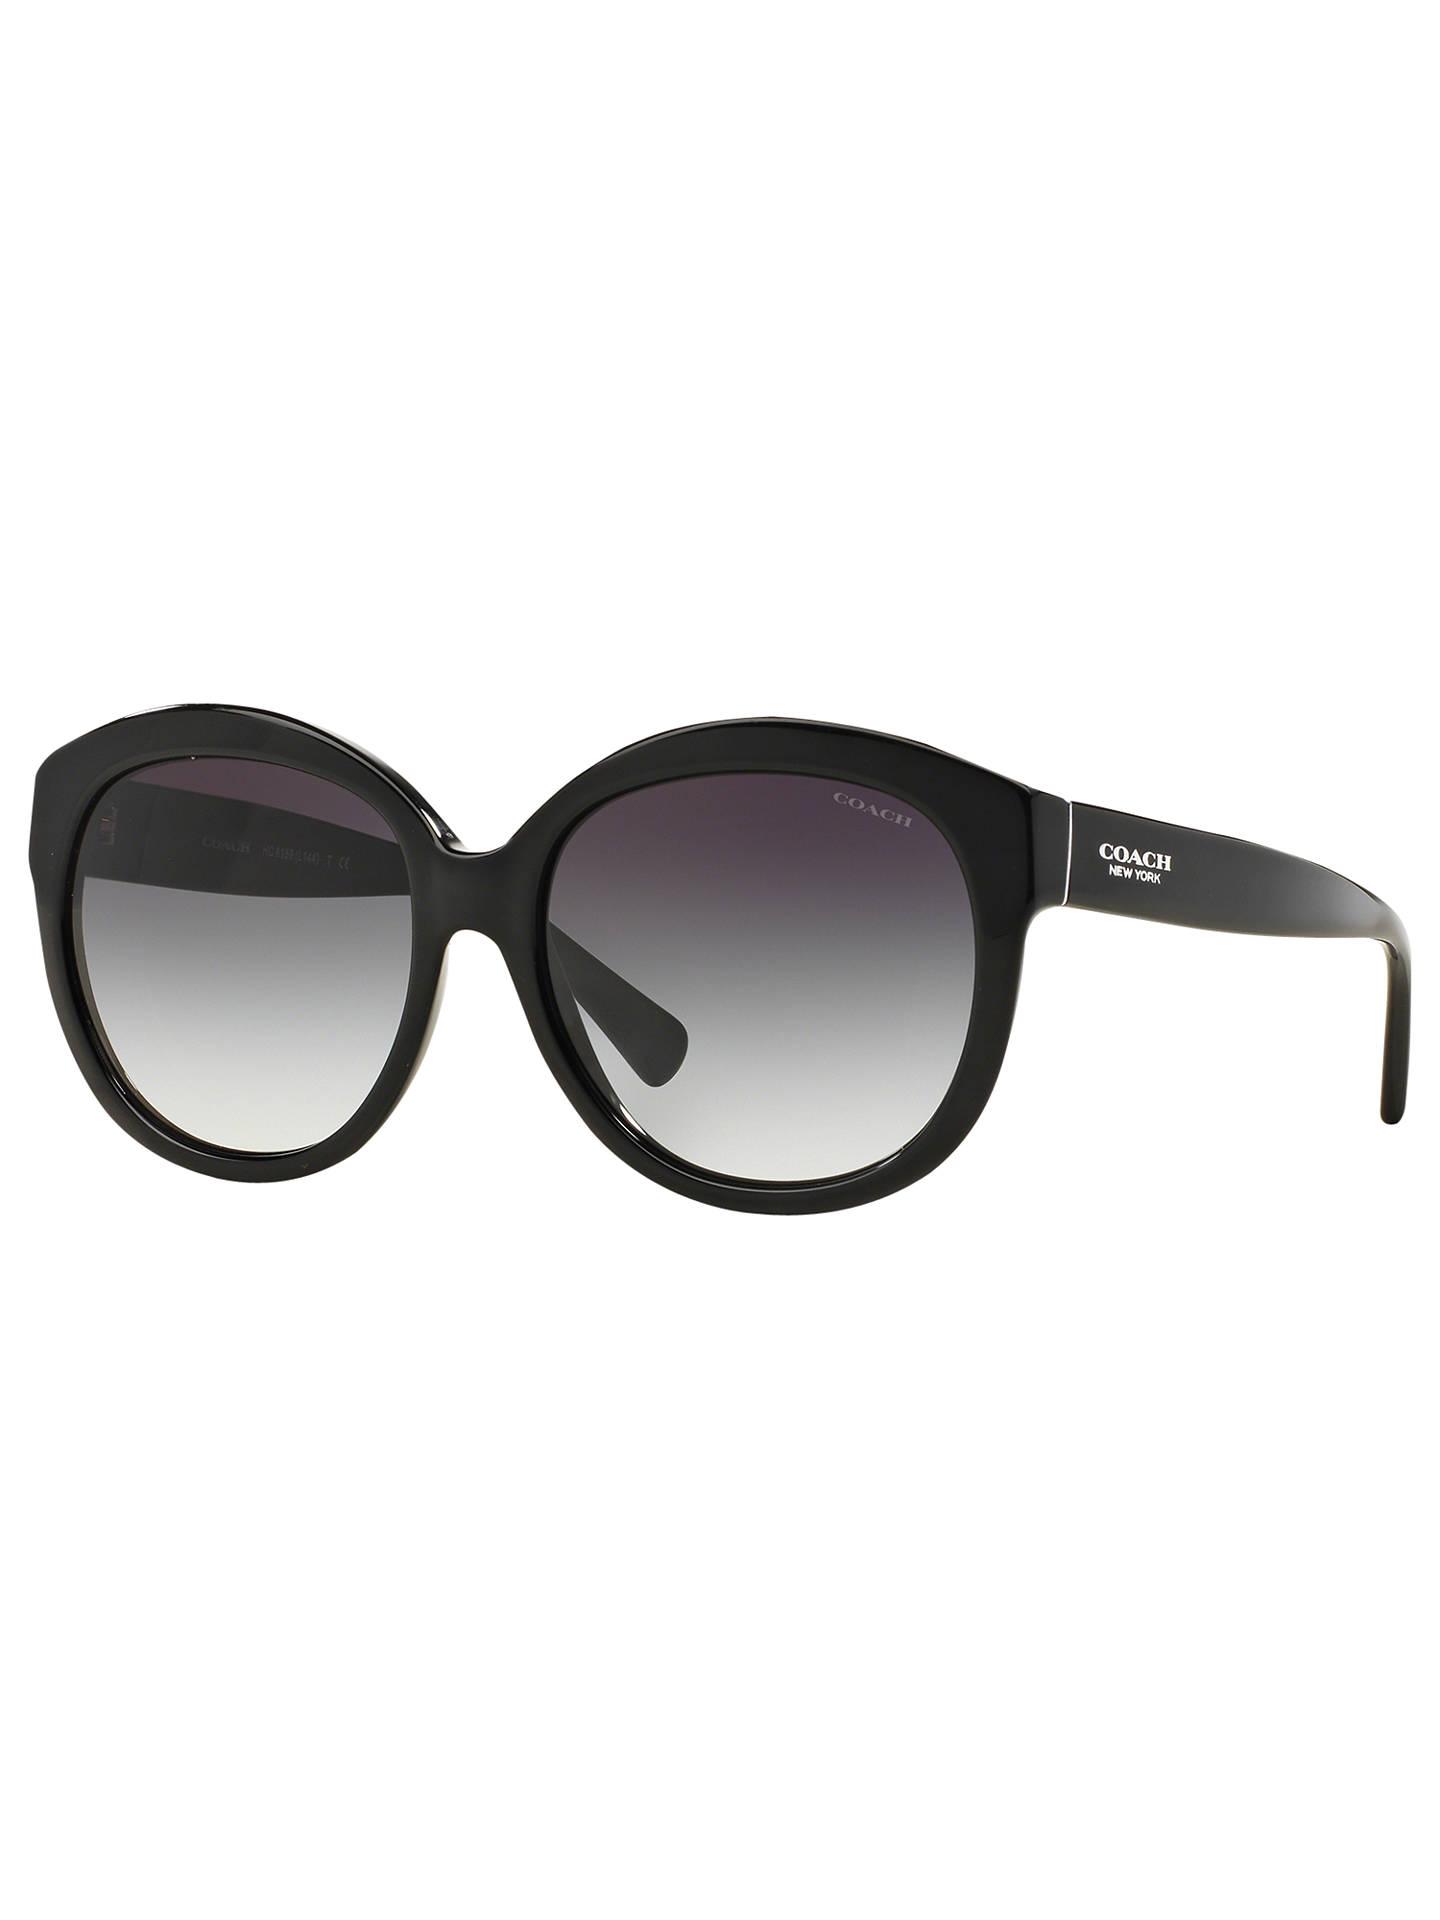 1353a3ad4845 Buy Coach HC8159 Gradient Round Sunglasses, Black Online at johnlewis.com  ...